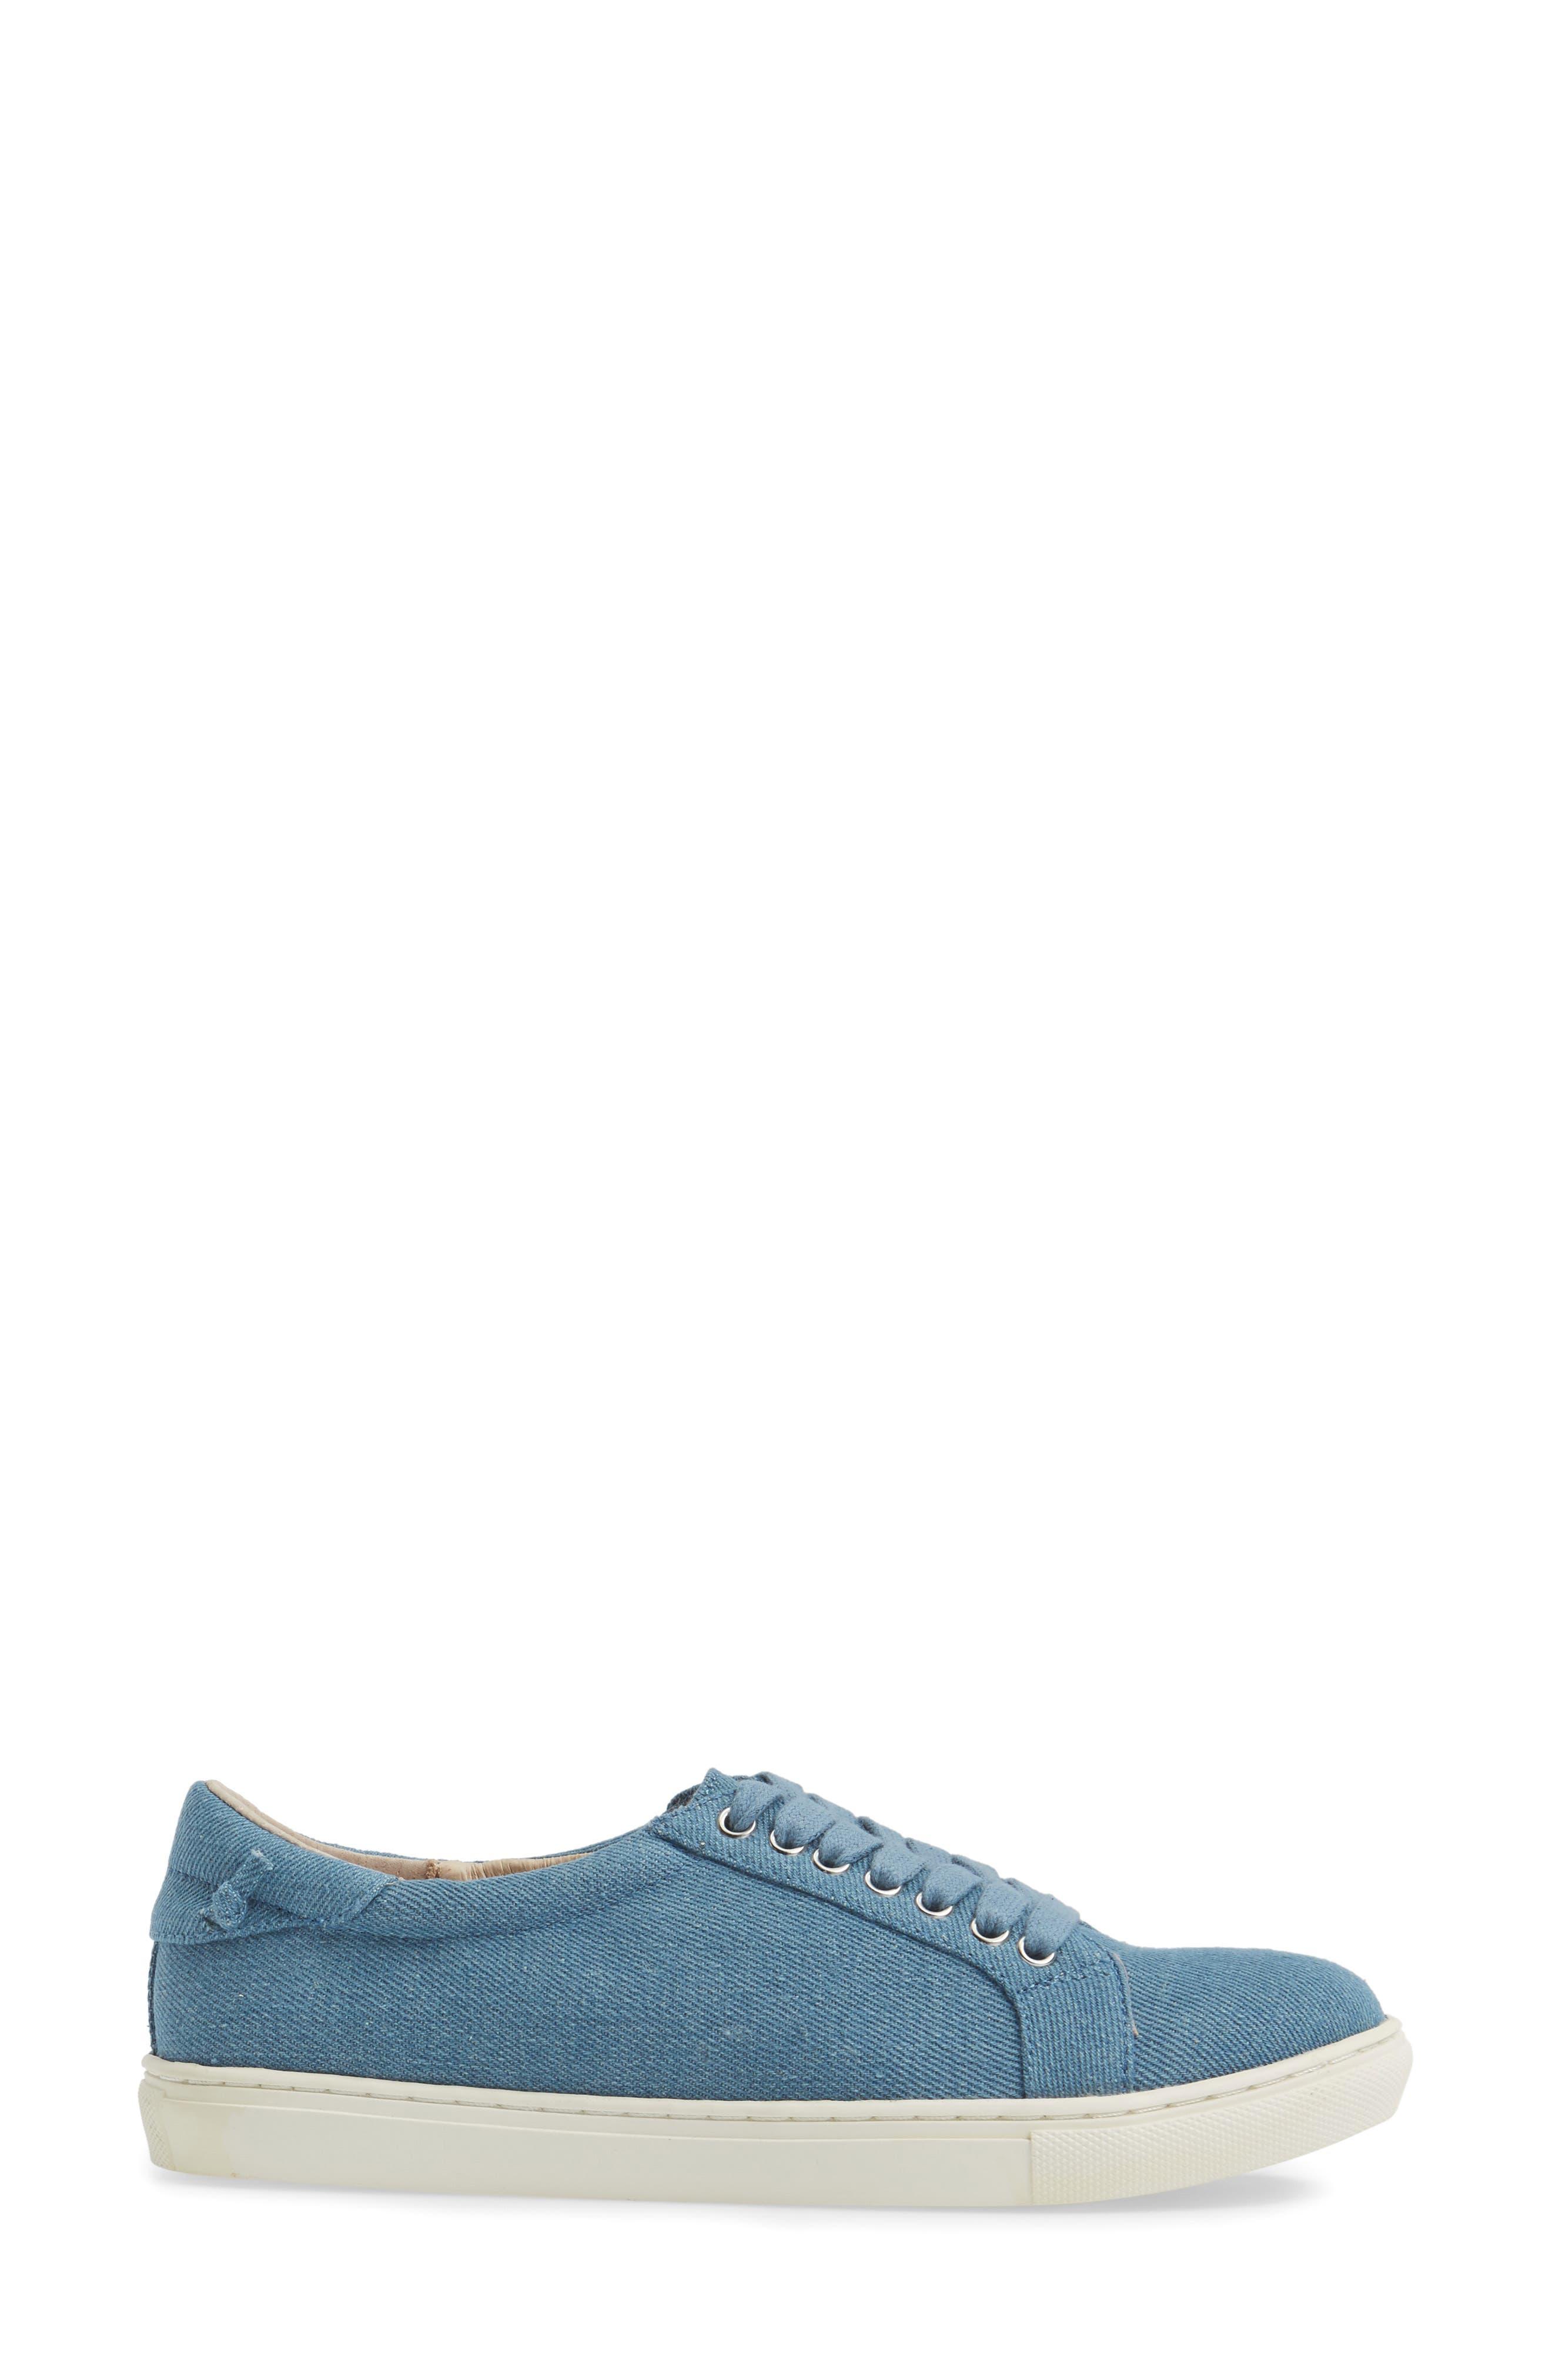 Alternate Image 3  - JSlides Cameron Sneaker (Women)